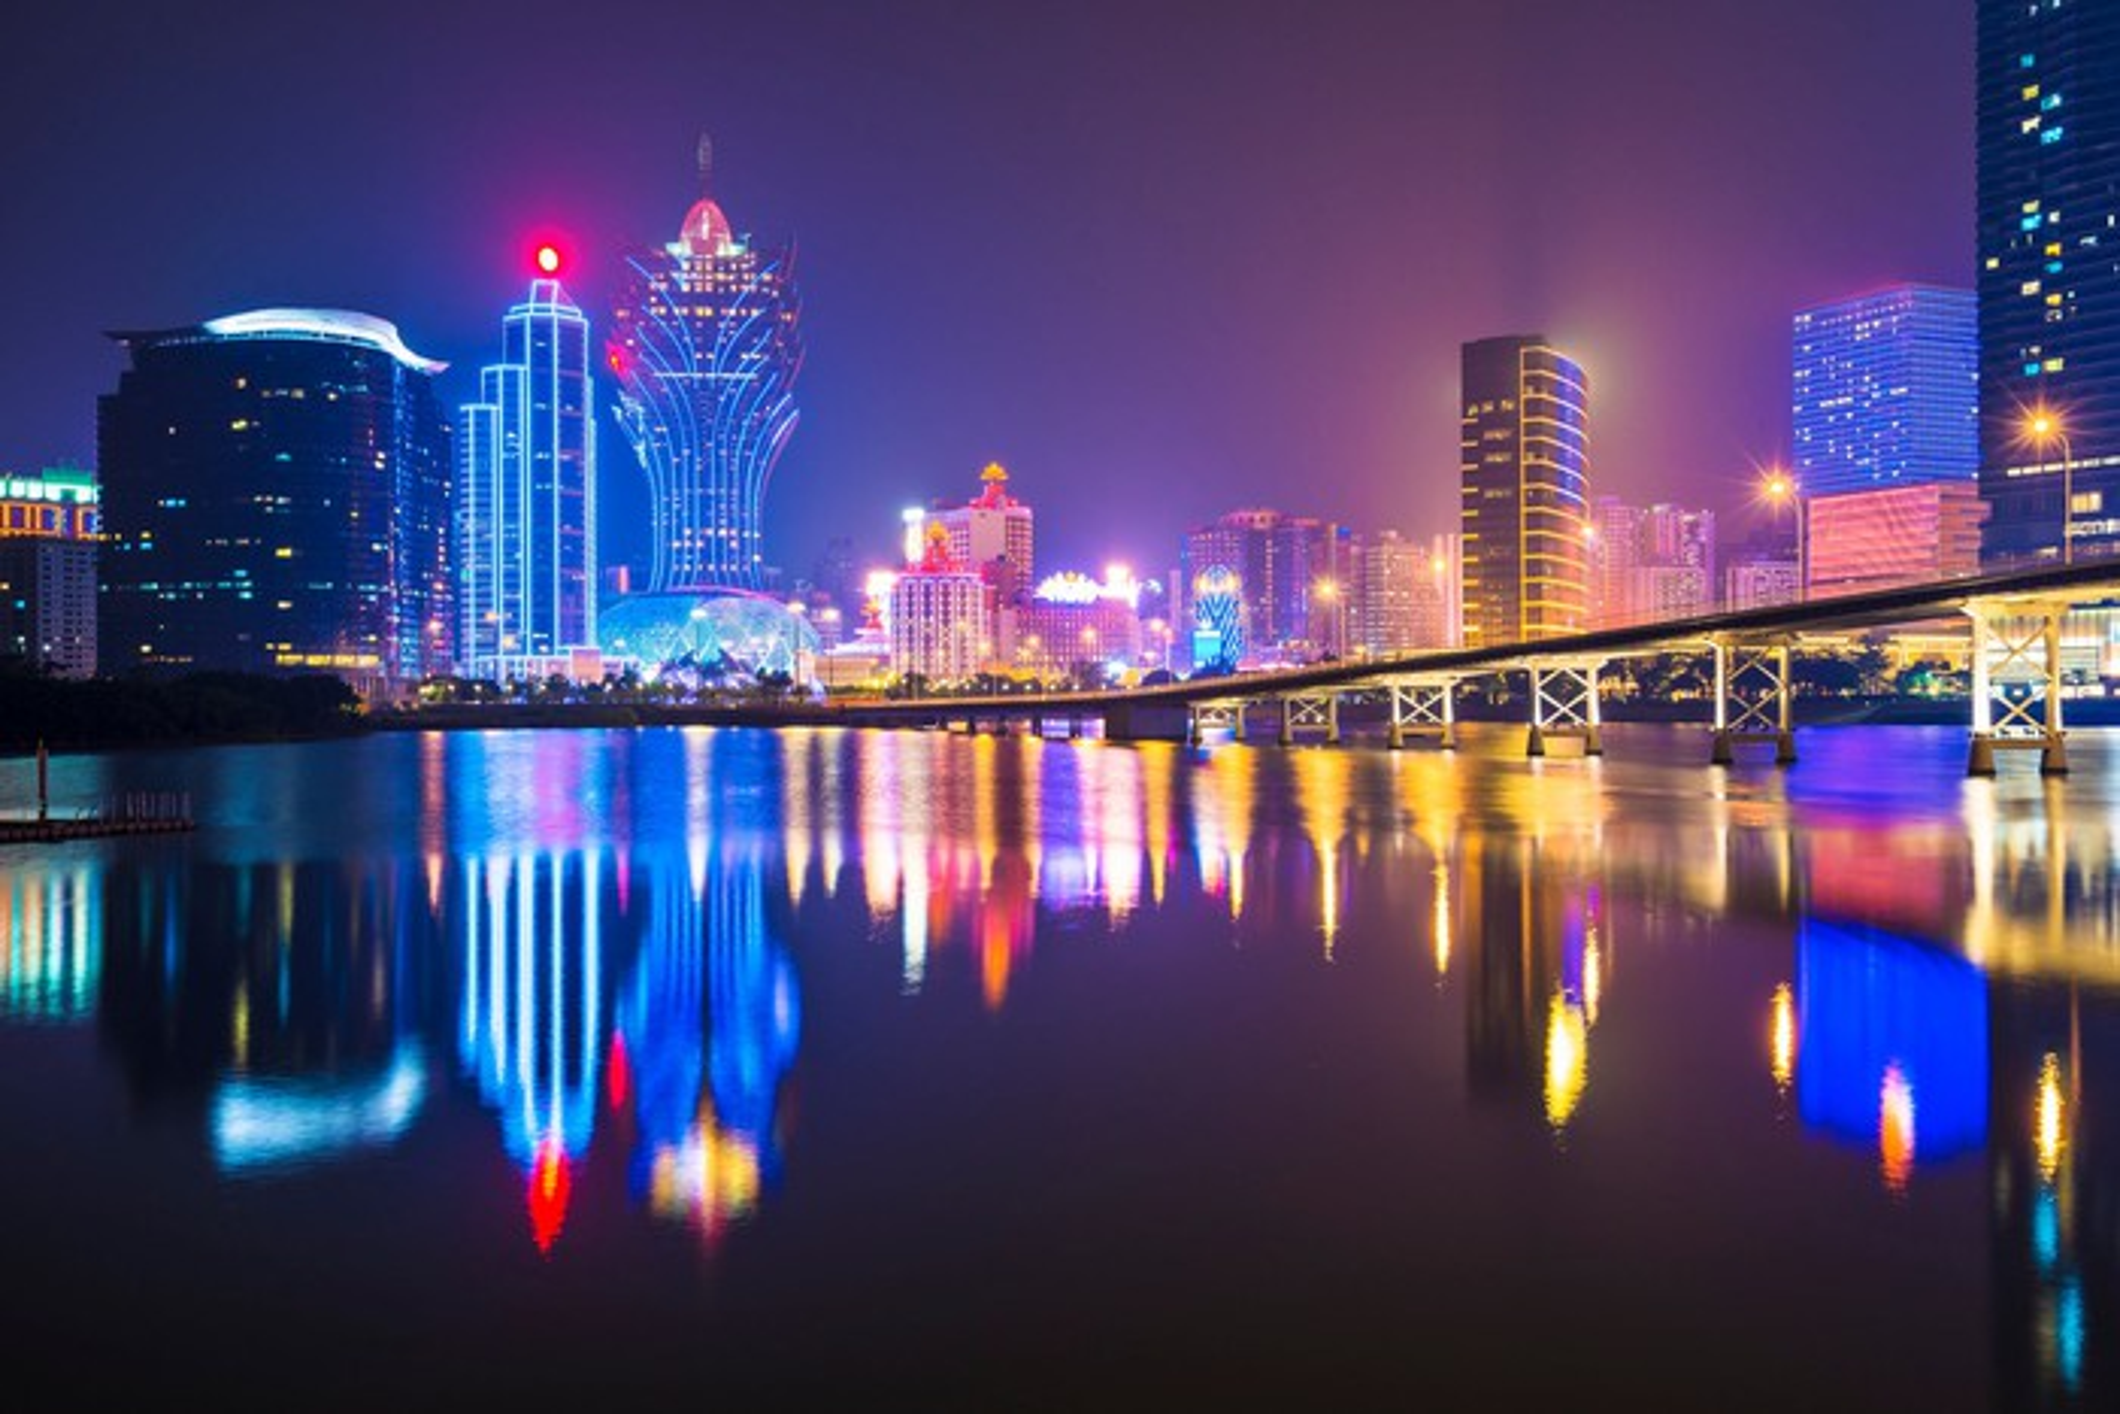 Macau's skyline.